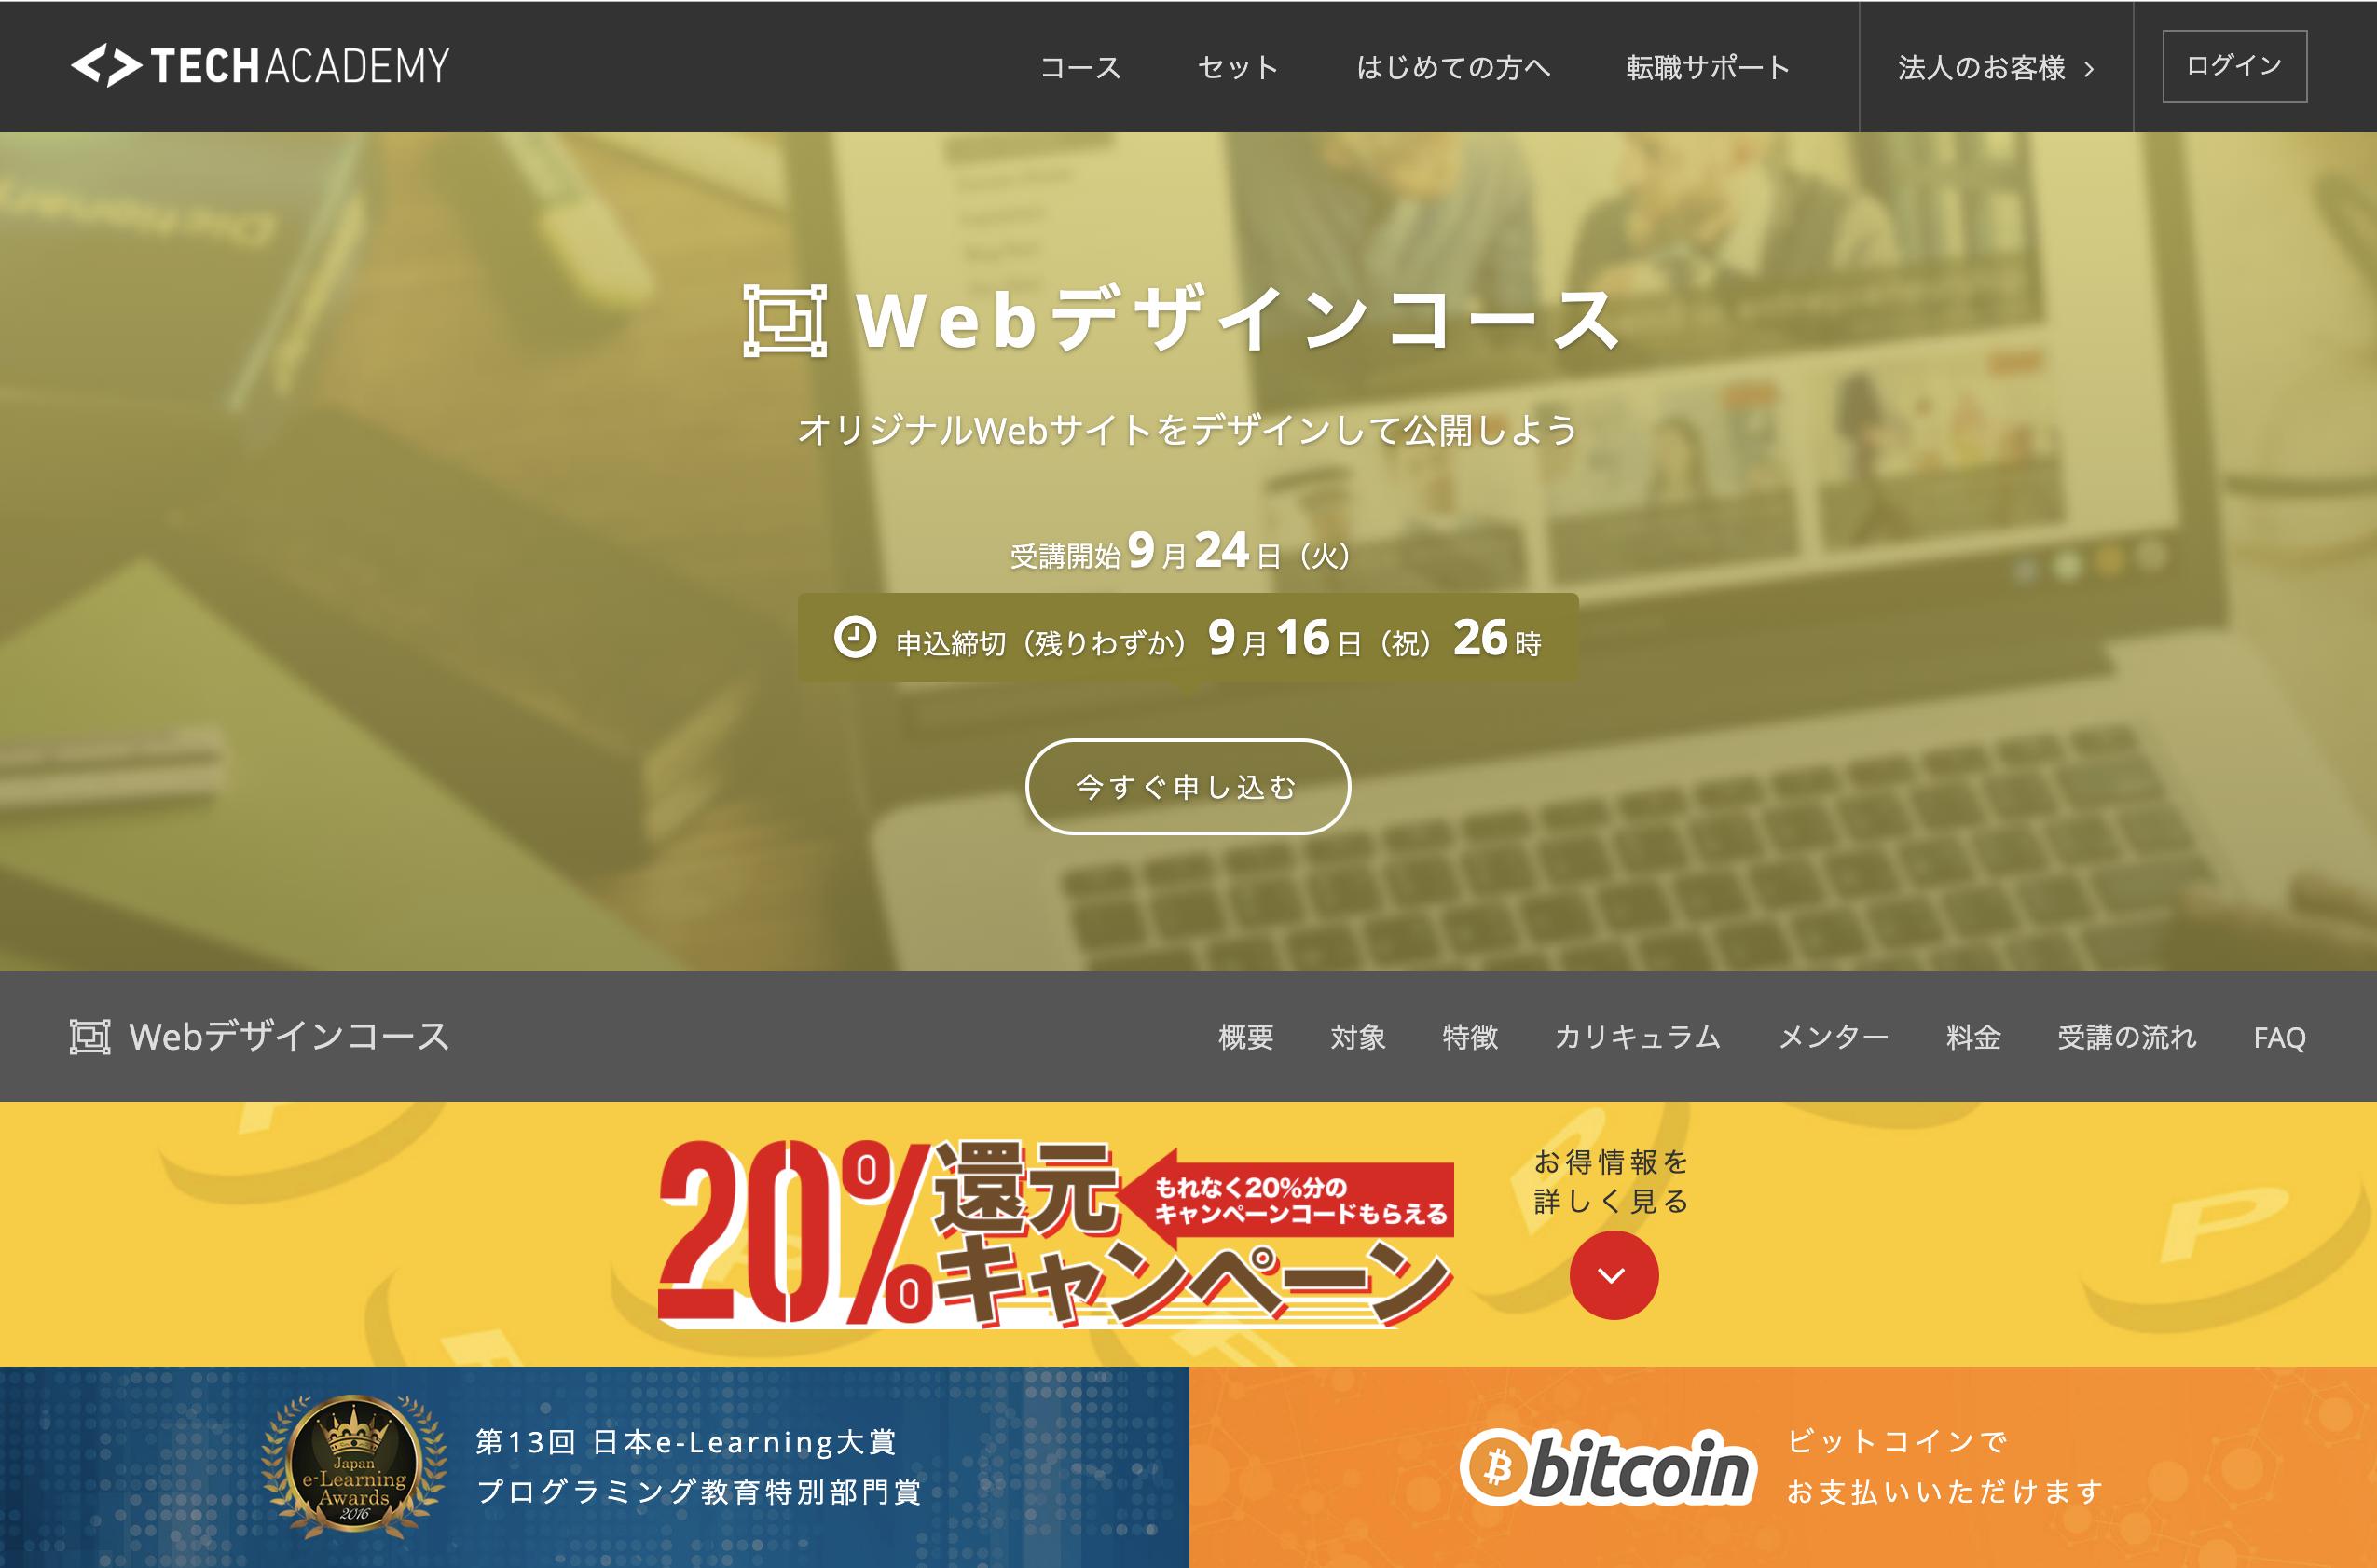 TechAcademy オンラインブートキャンプ Webデザインコースの公式サイトのスクリーンショット